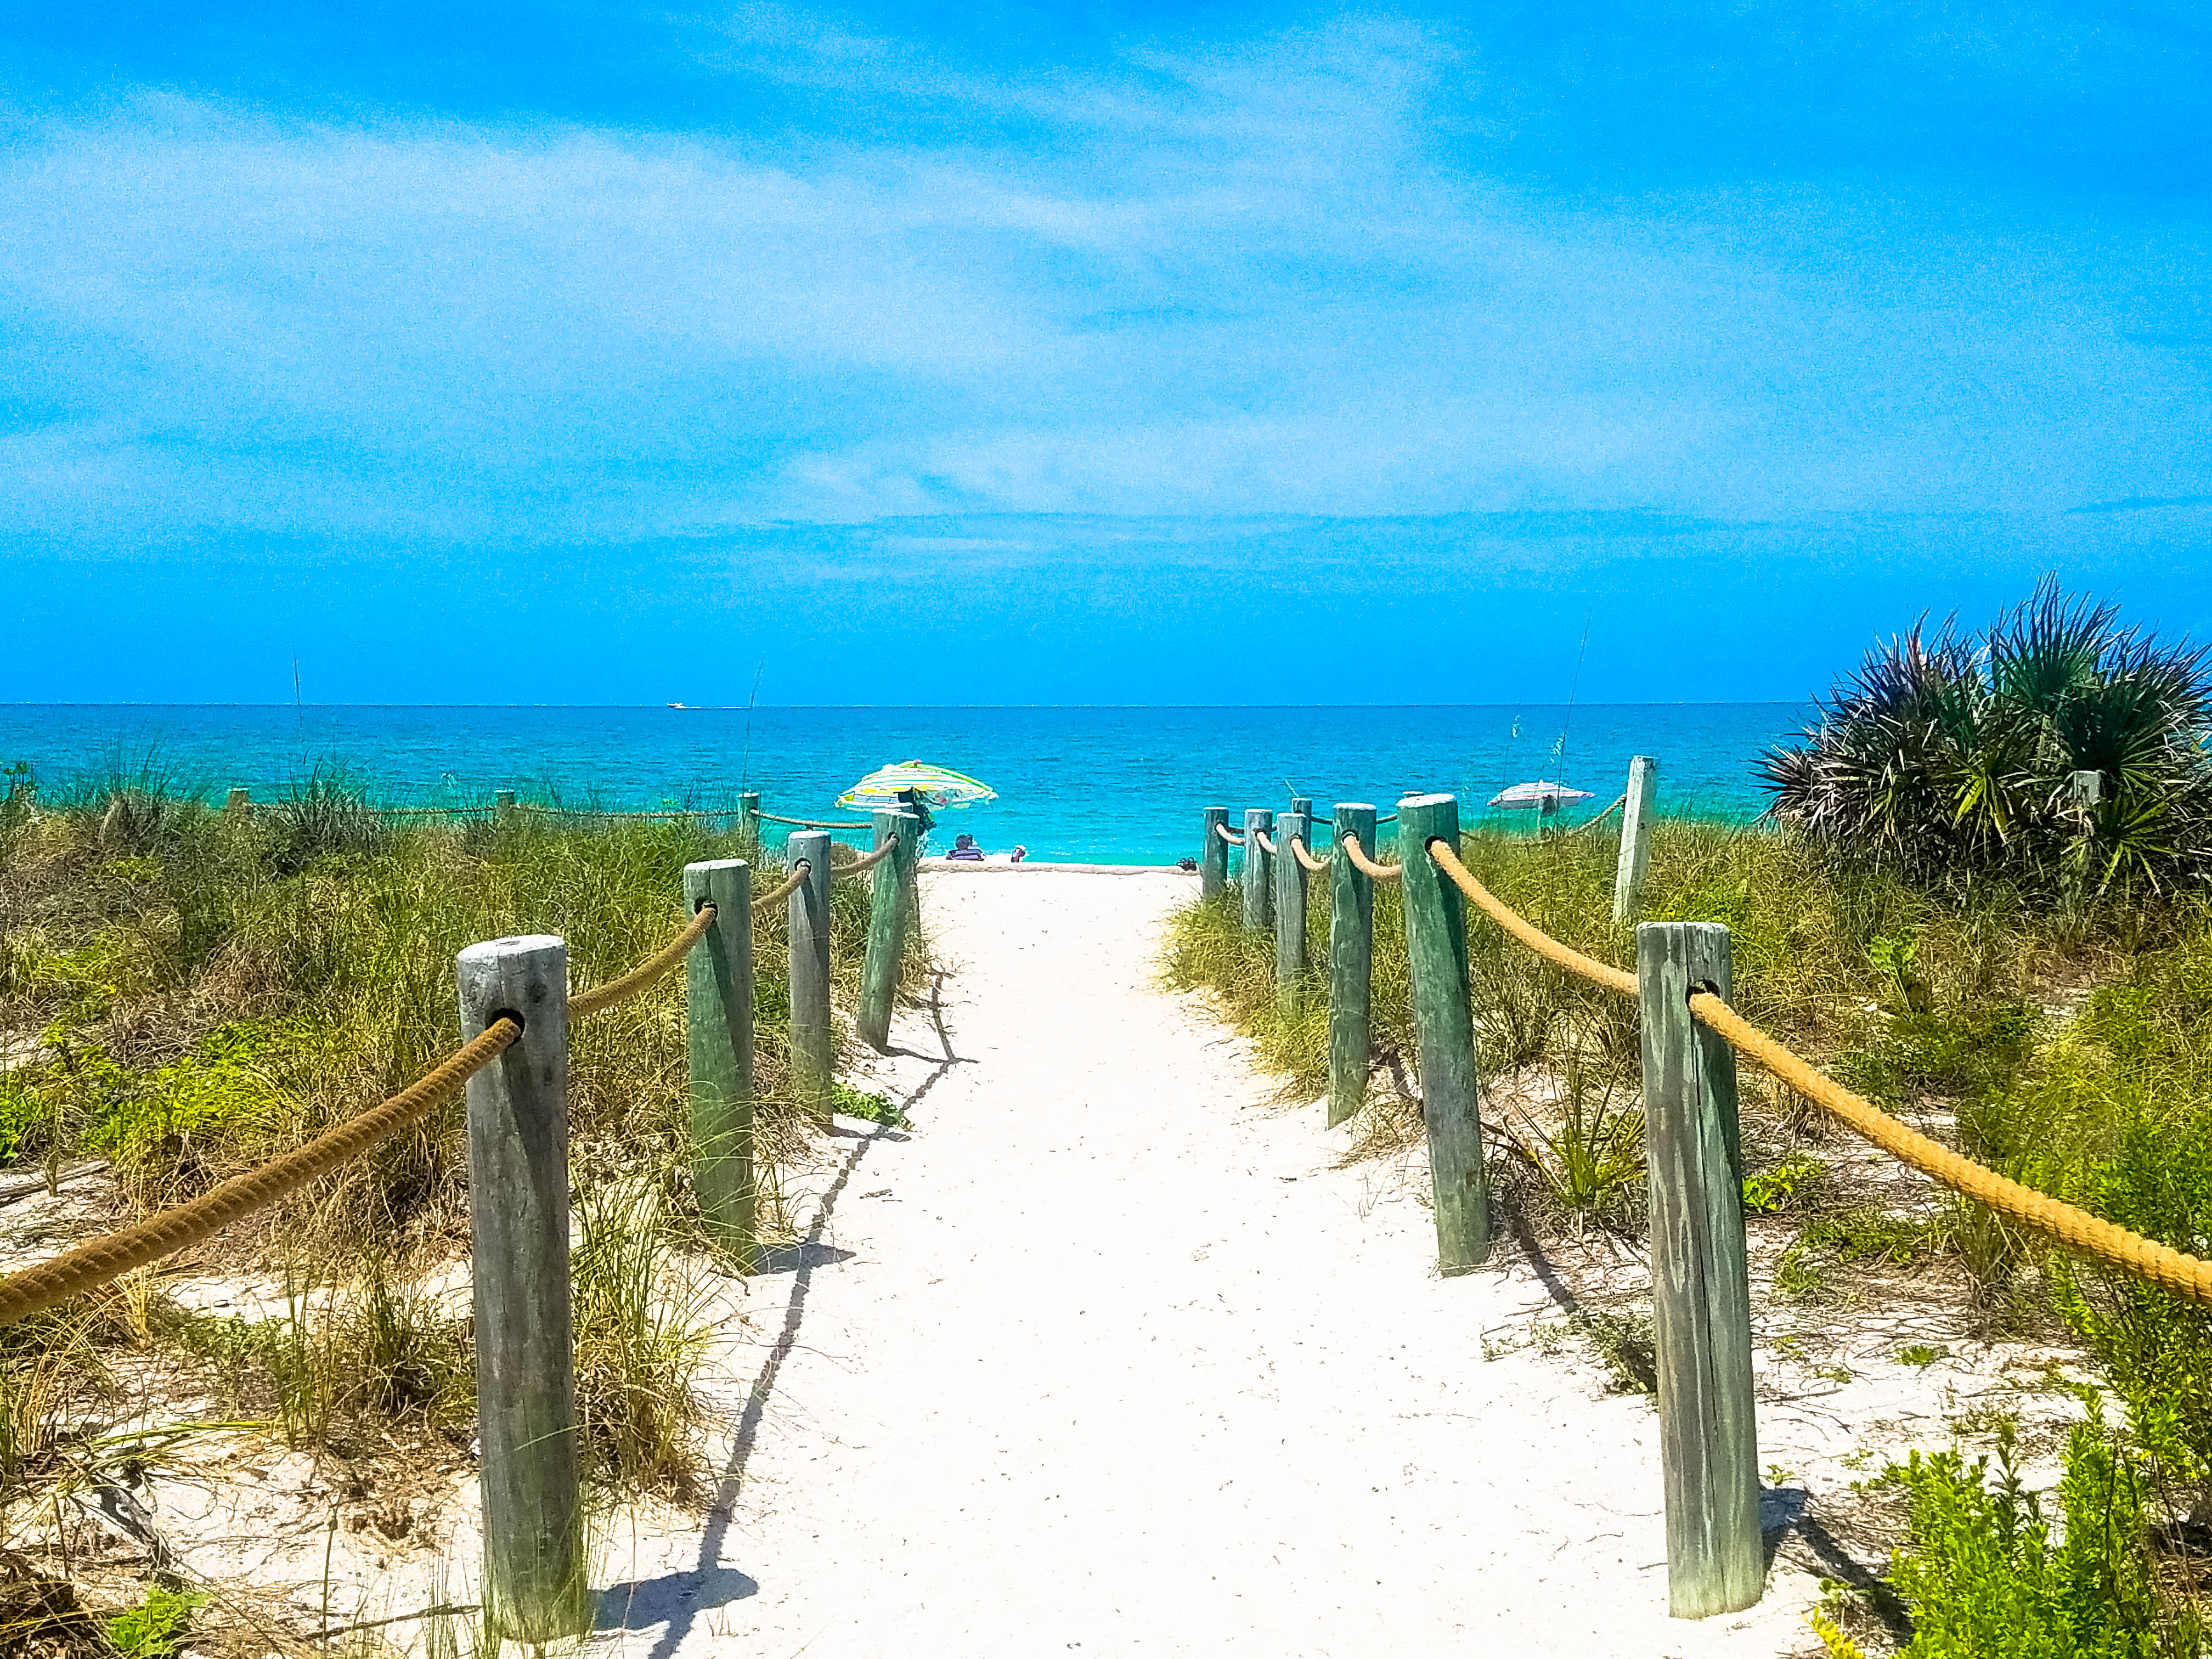 Sunday Snapshots: Englewood Beach, Florida - And She Travels